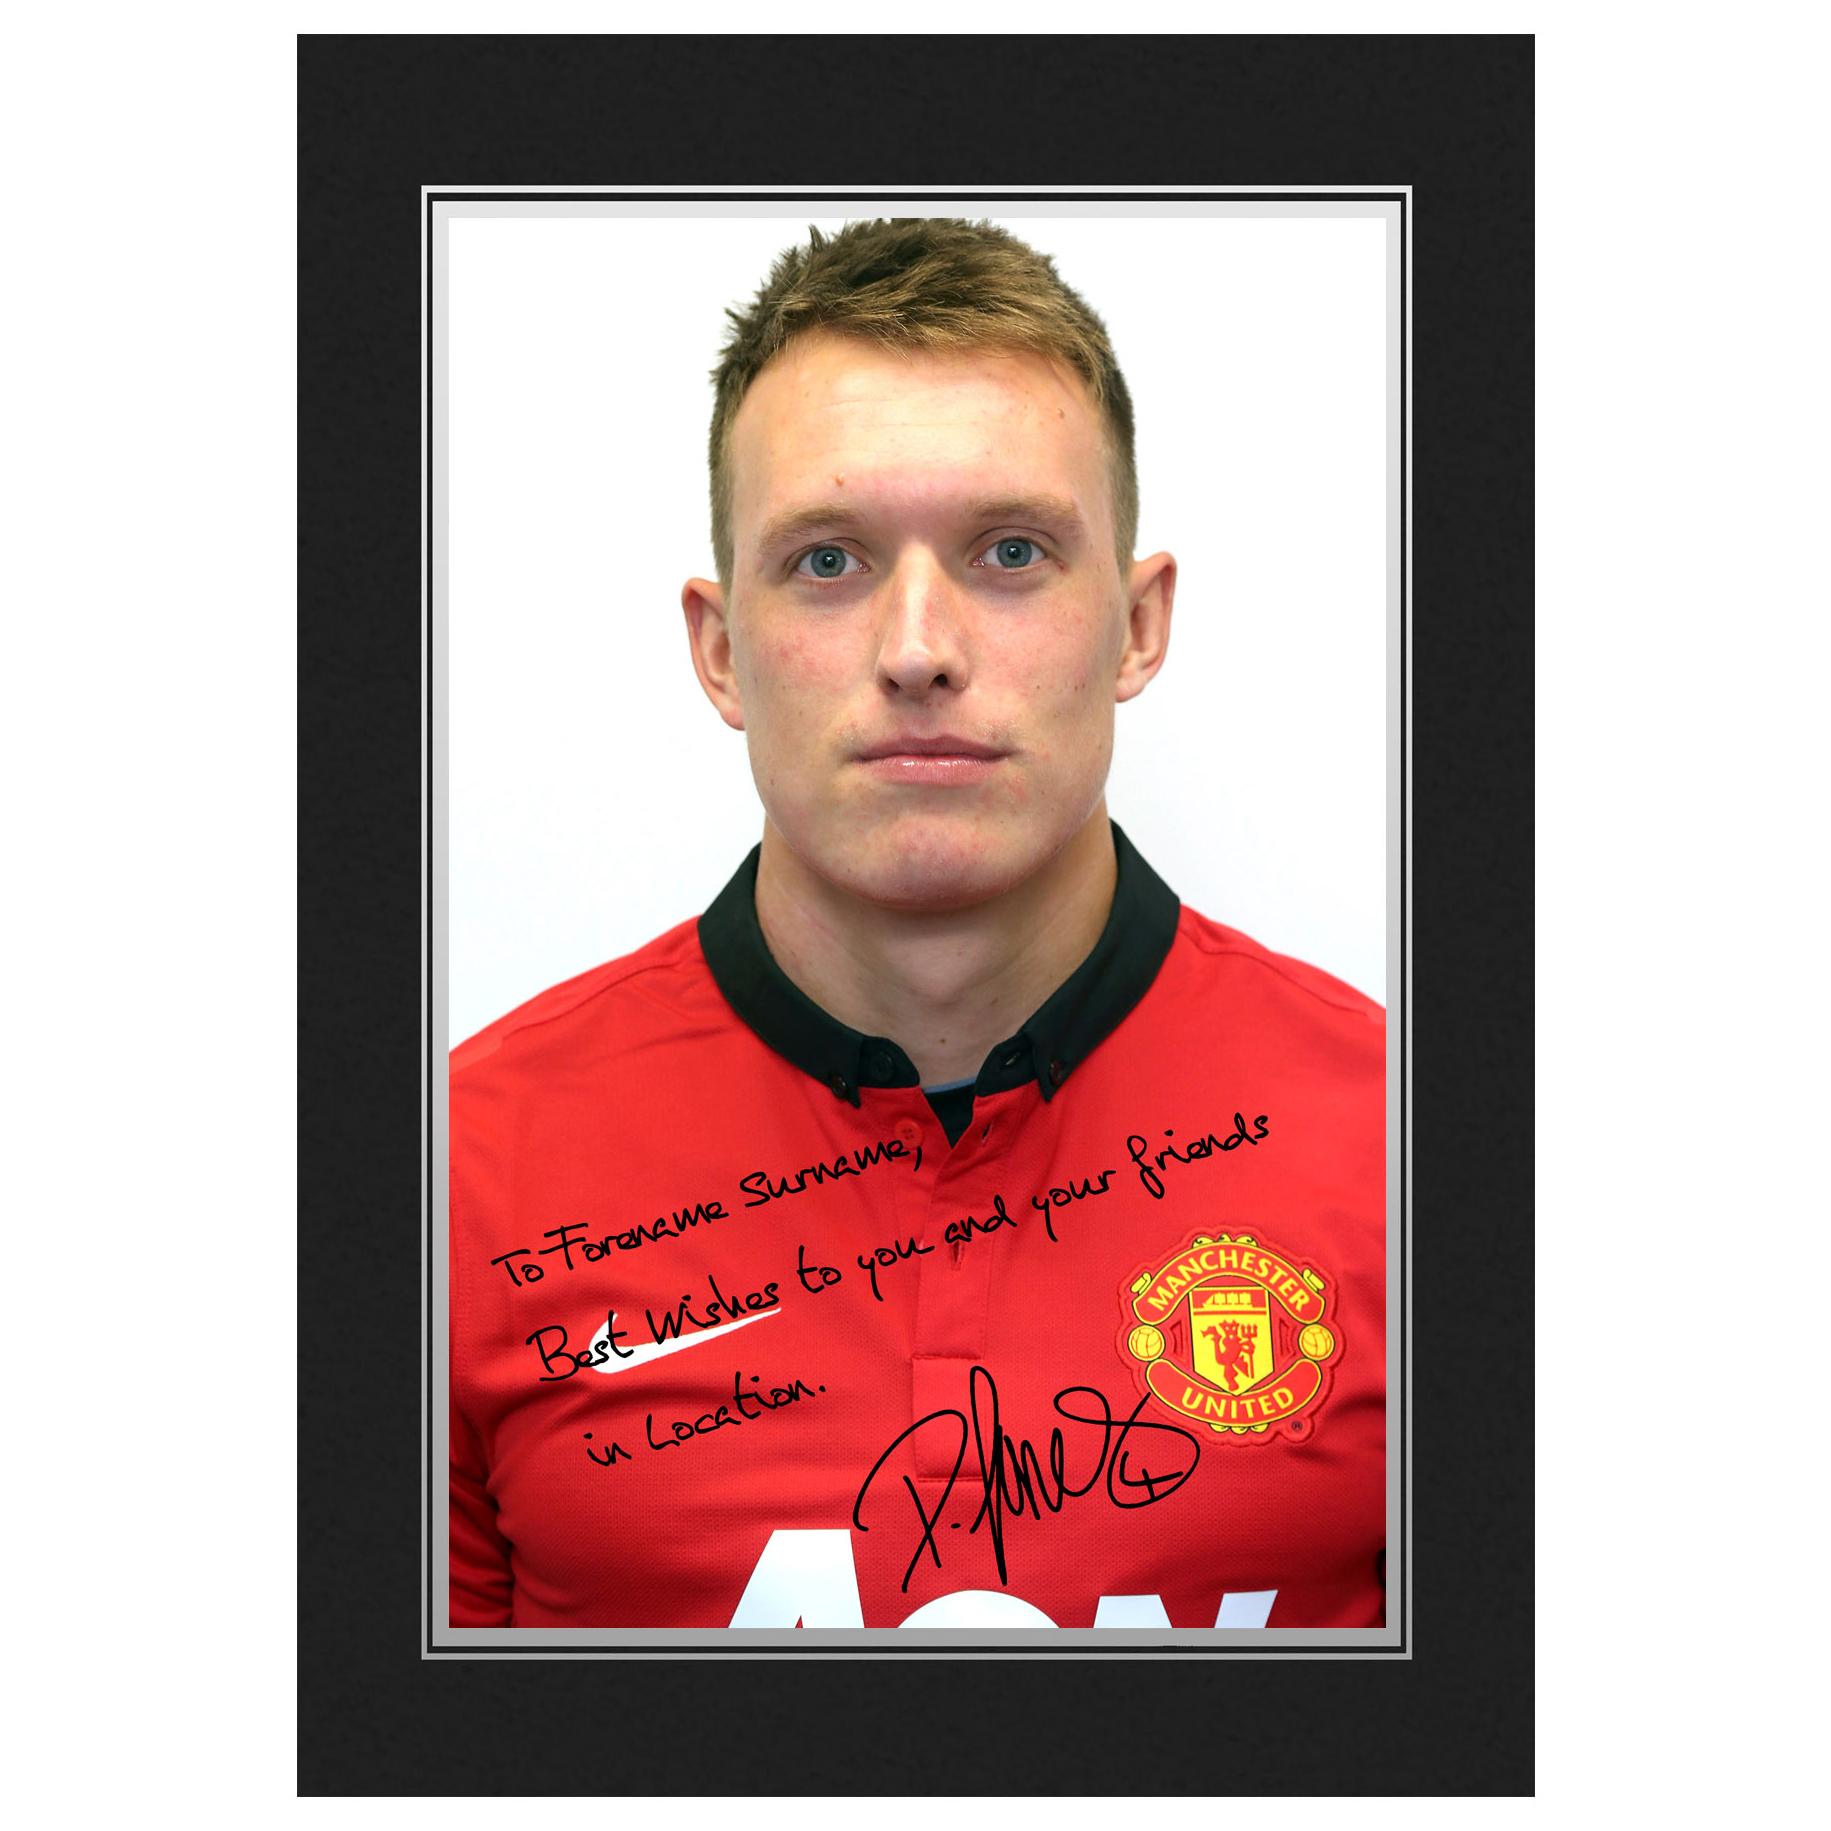 Manchester United Personalised Signature Photo In Presentation Folder - Jones